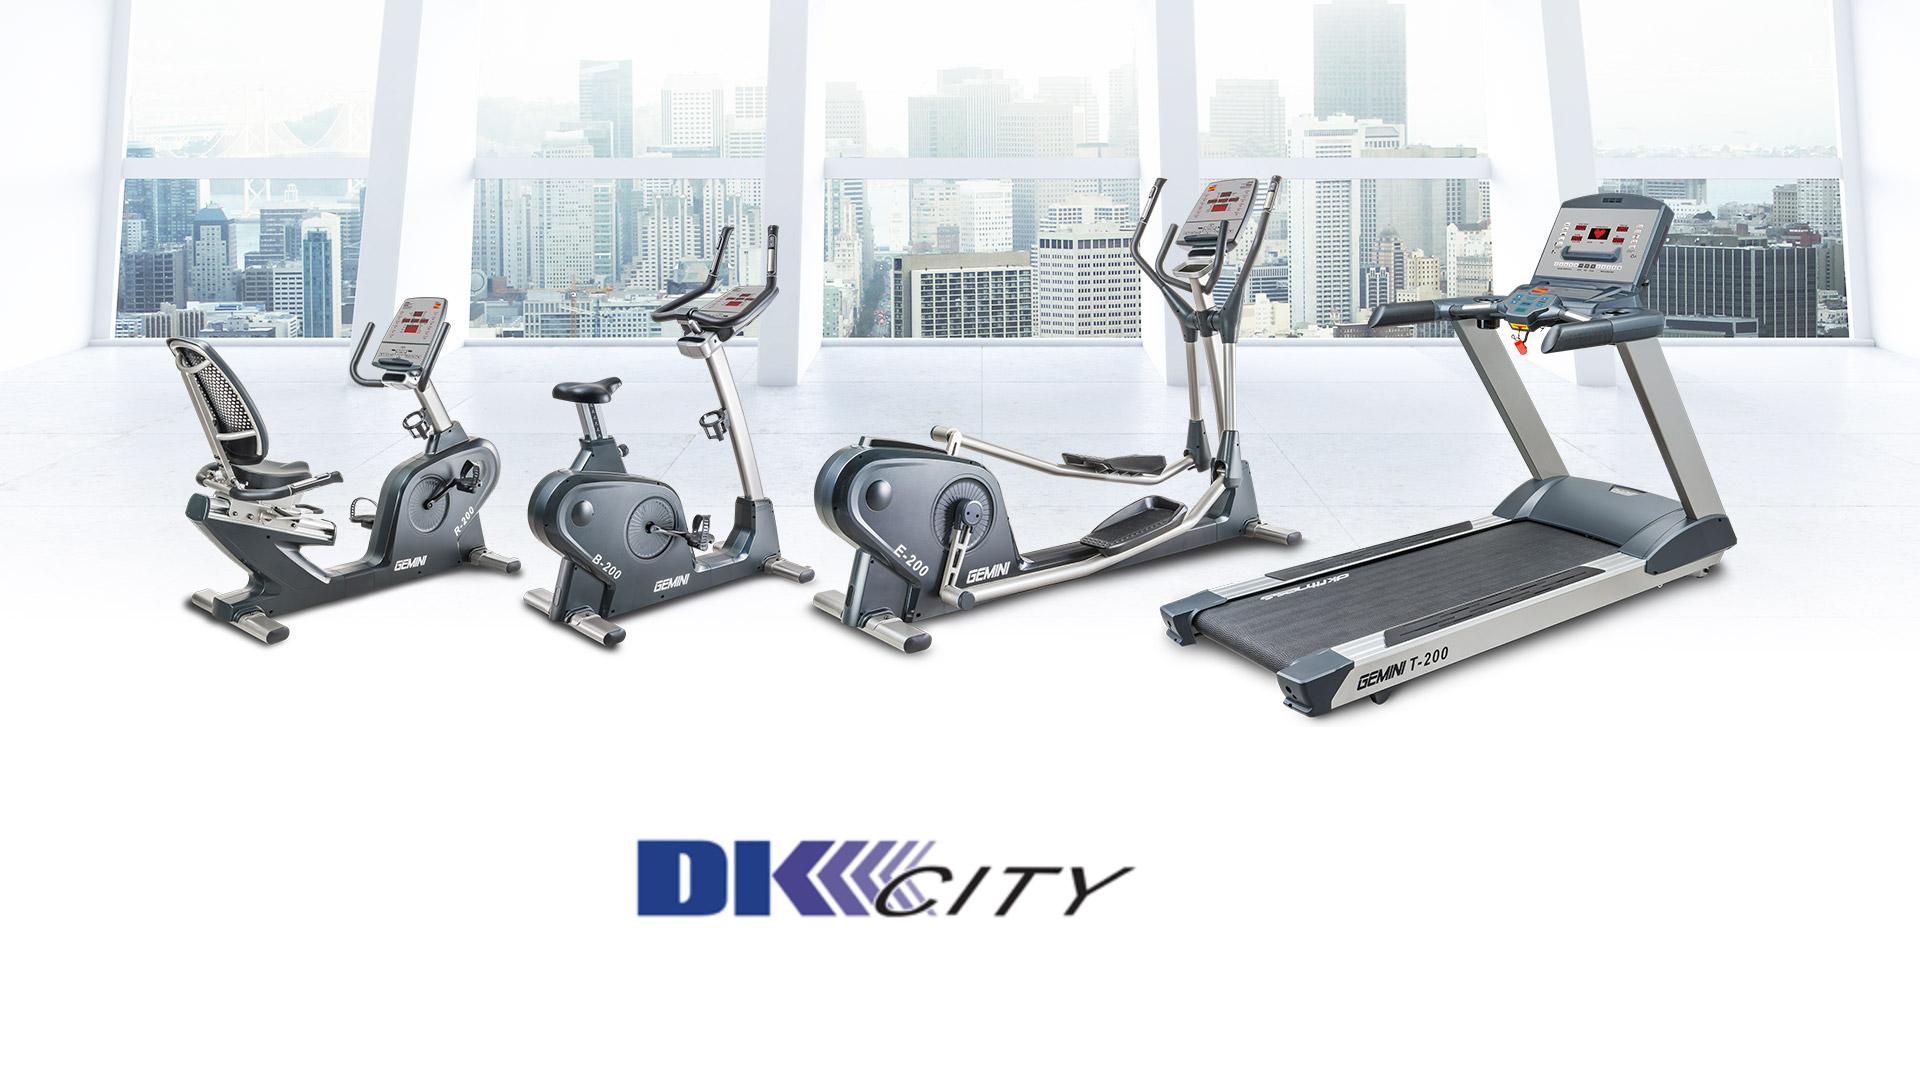 DK City